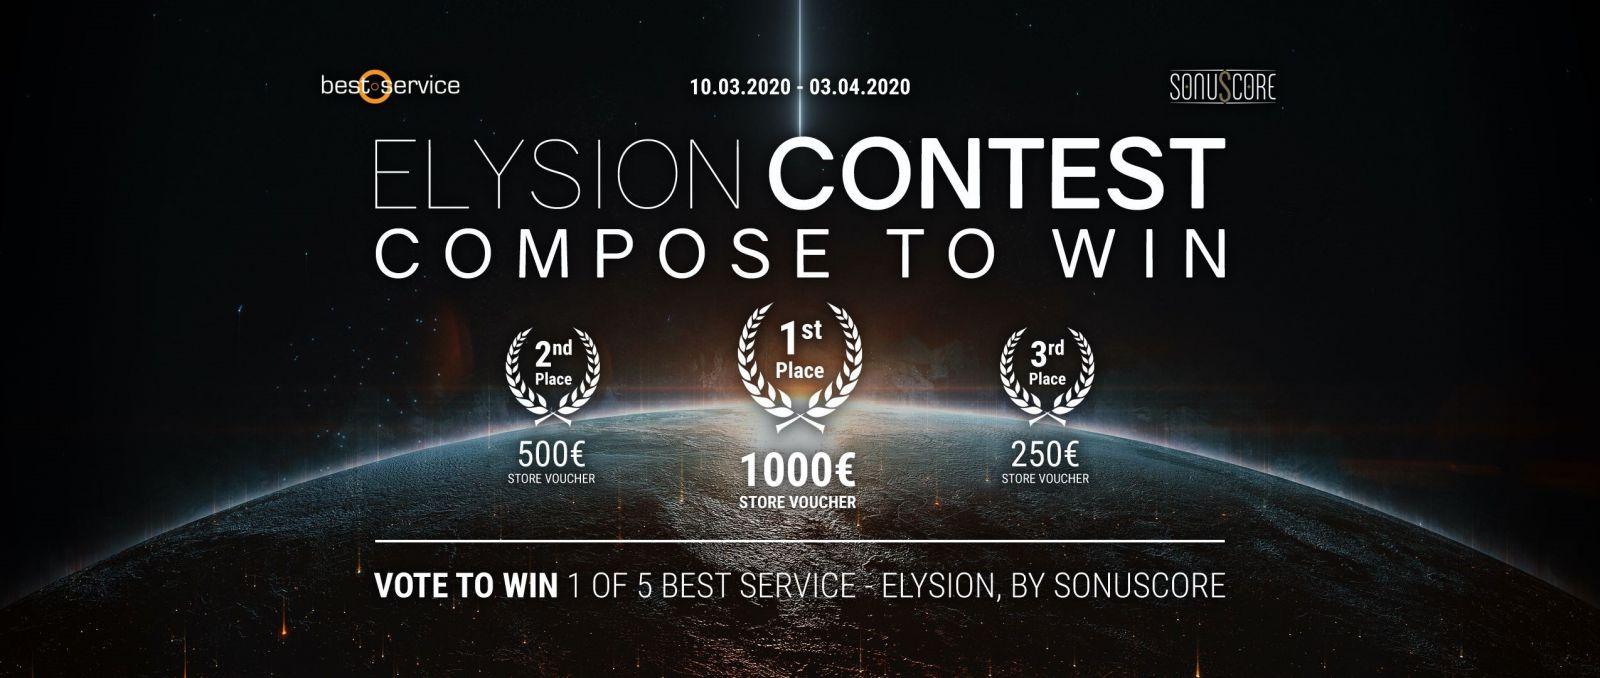 Elysion Composer Contest